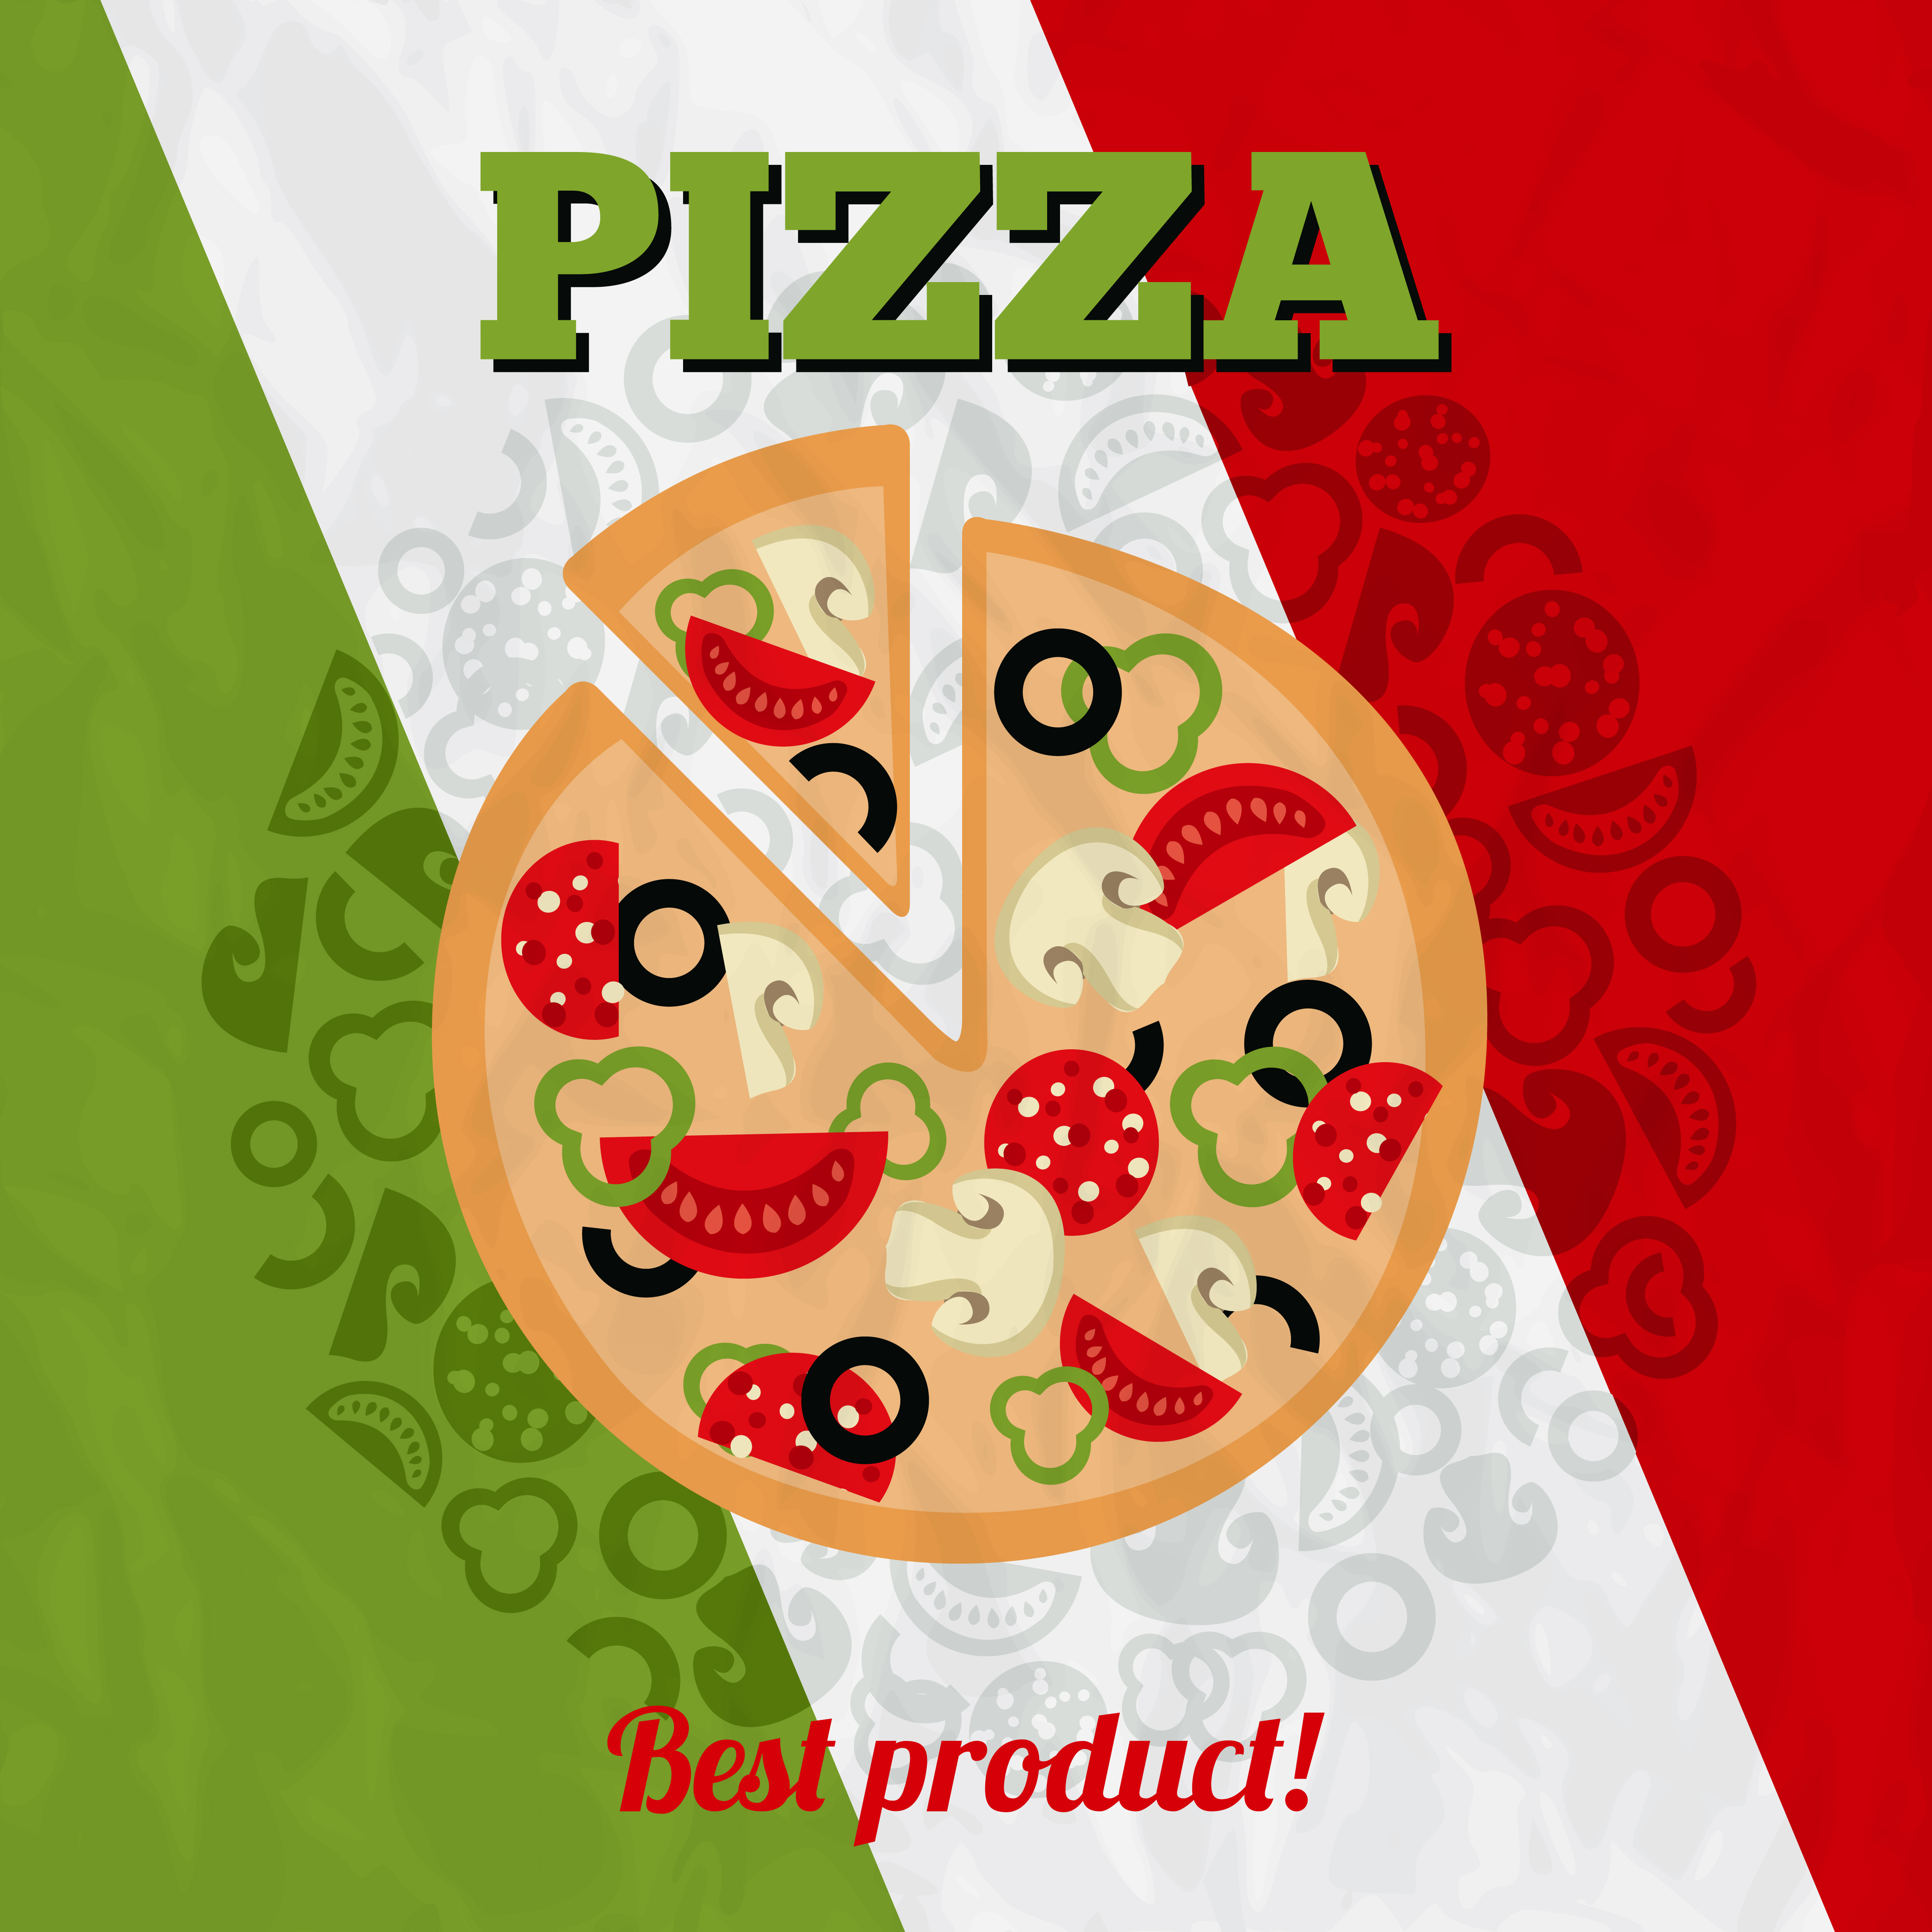 Italian Restaurant Logo With Flag: Download Free Vector Art, Stock